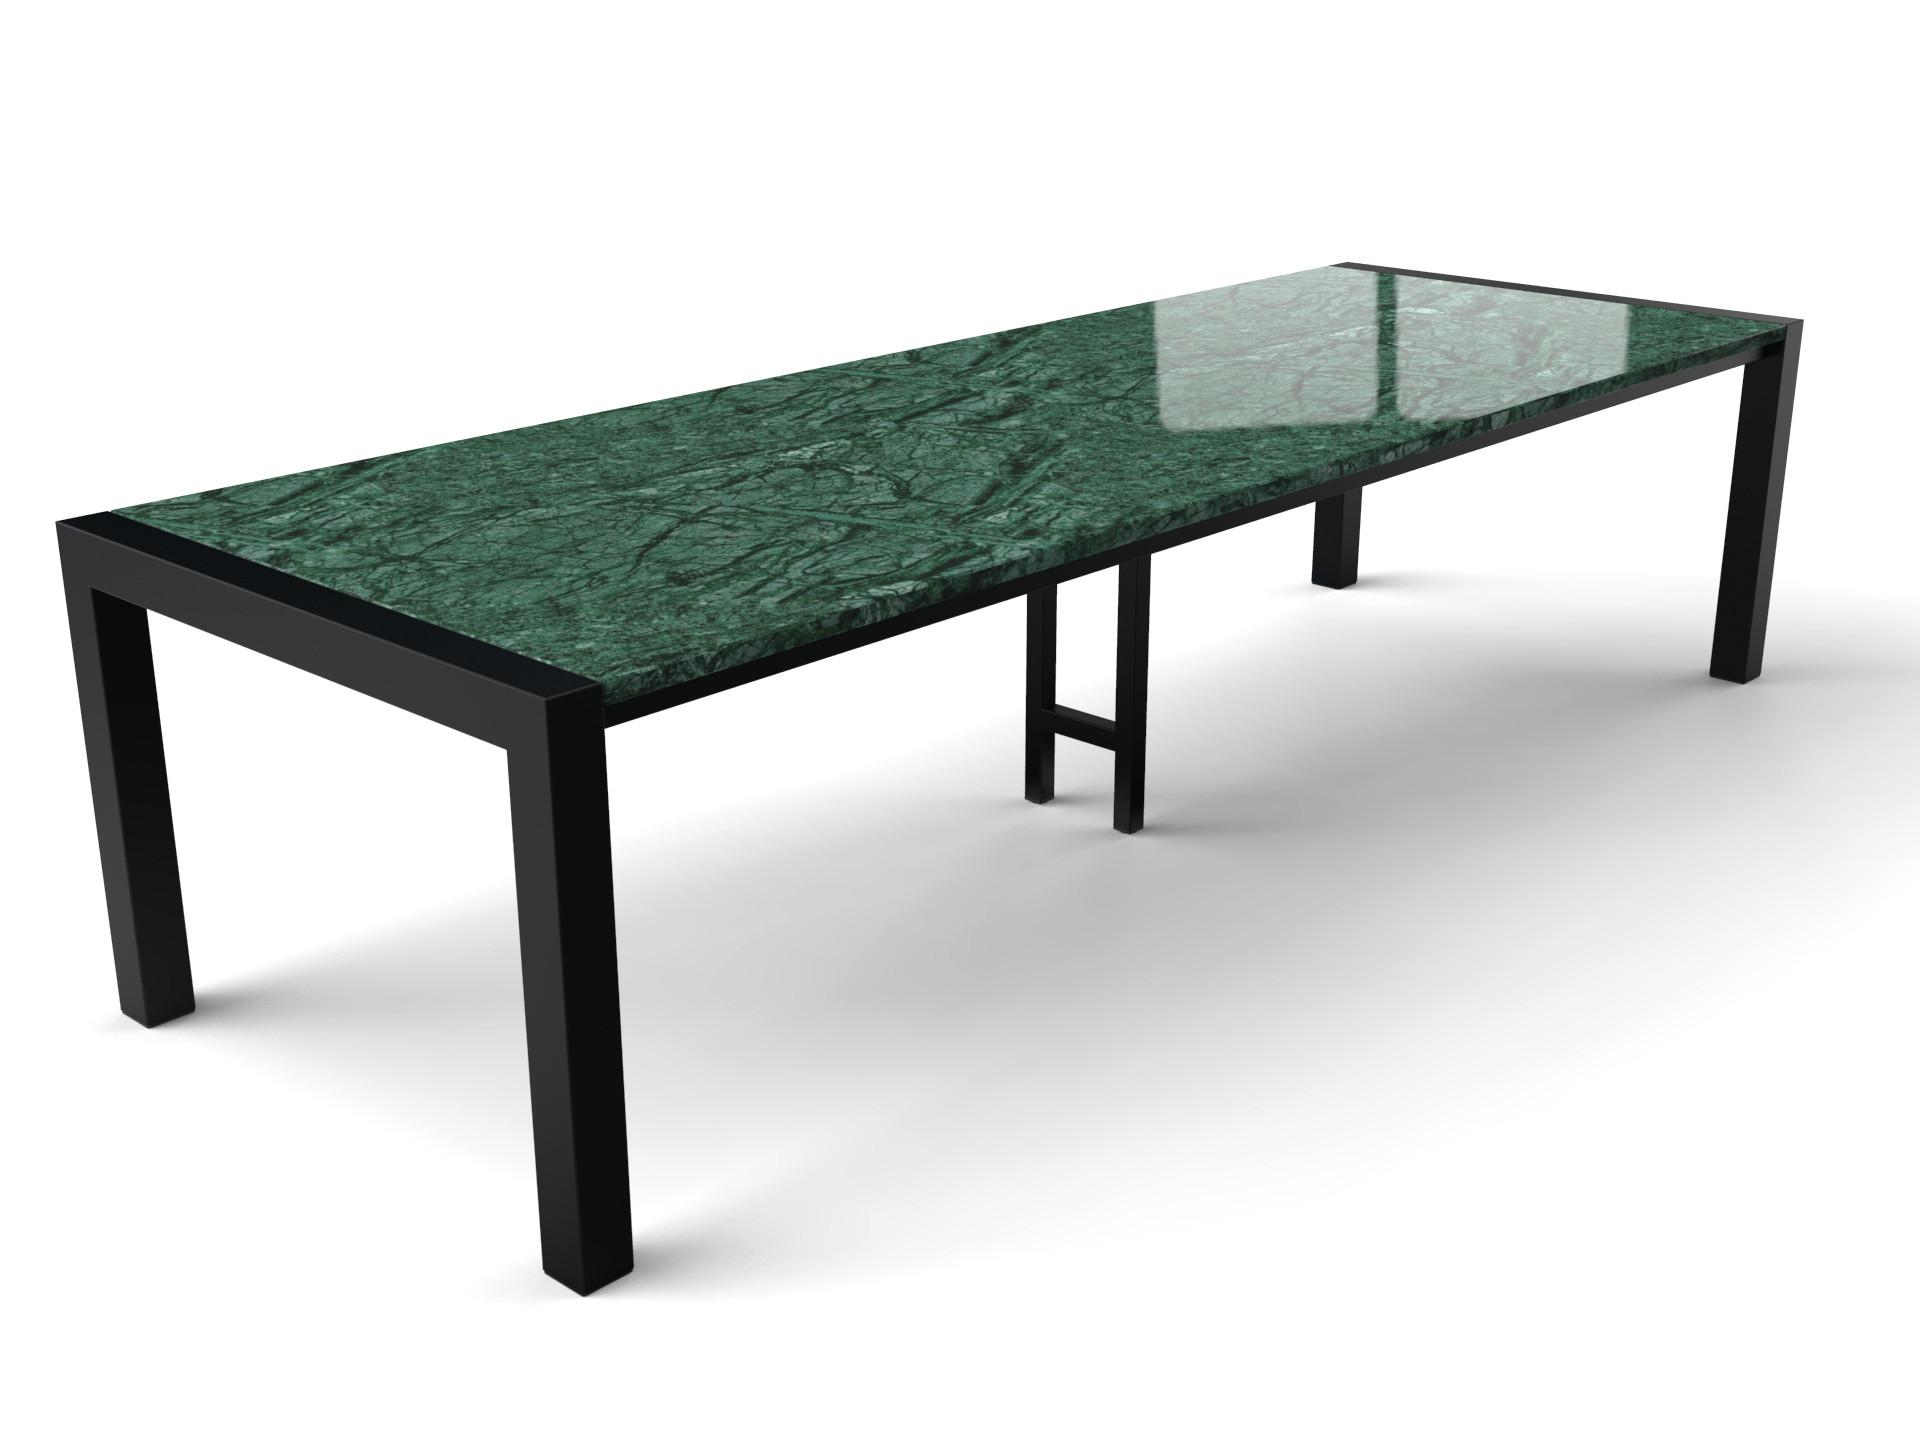 Grote marmeren tafel met groene Verde Guatemala tafelblad